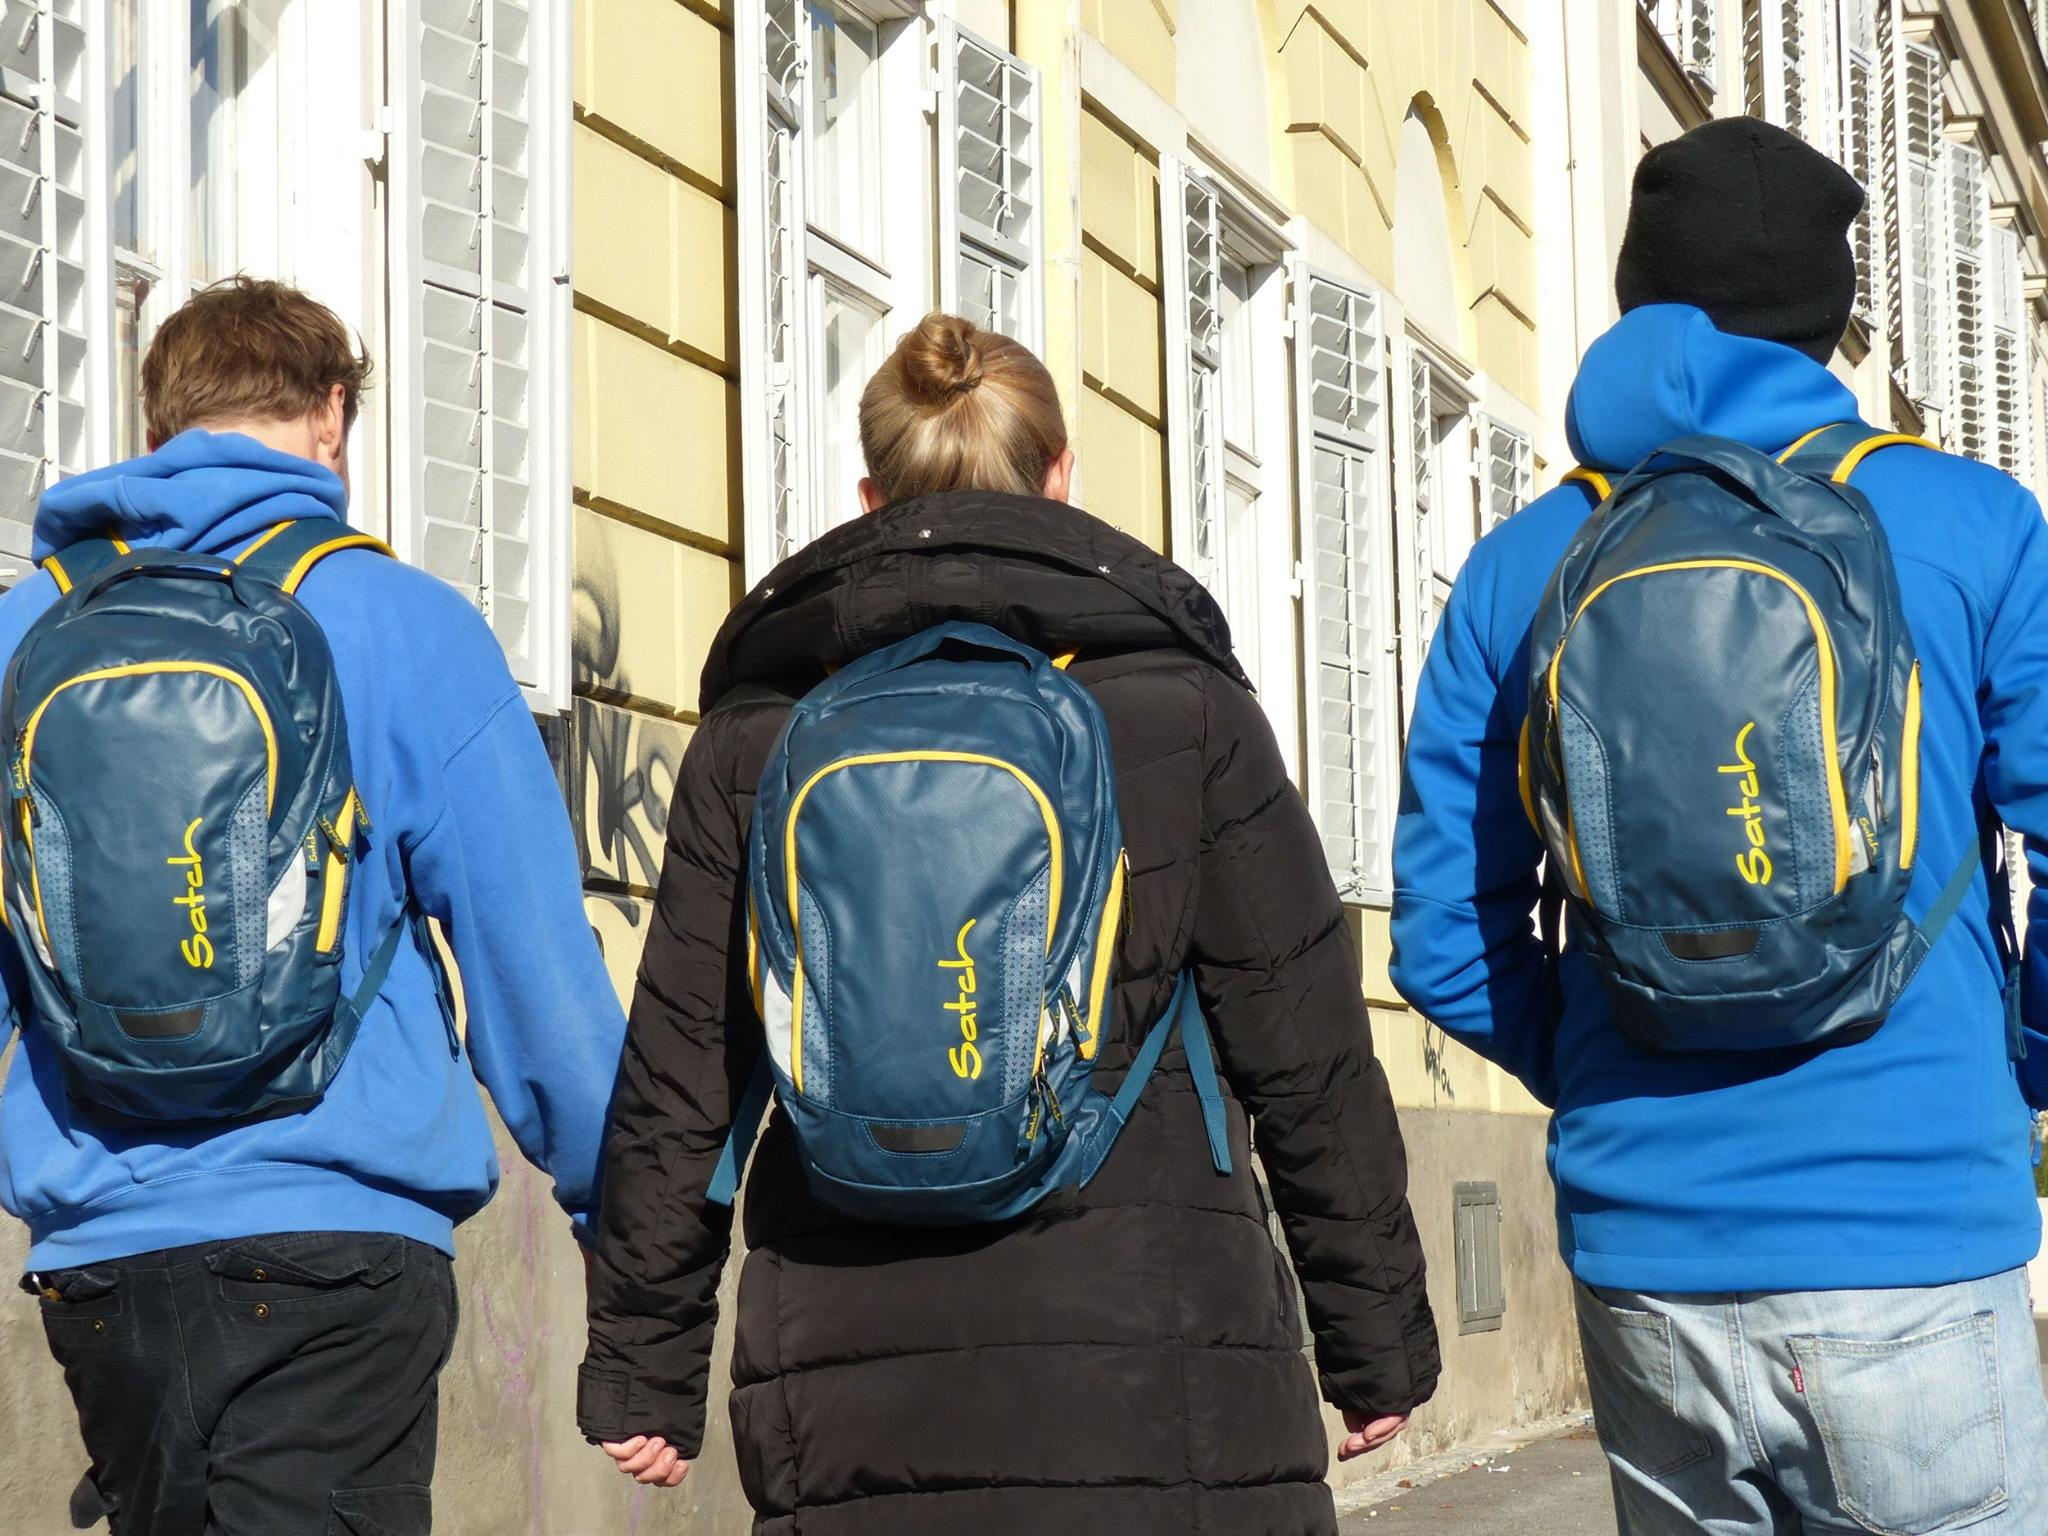 Jugendstreetwork Graz: Vertrauenspersonen